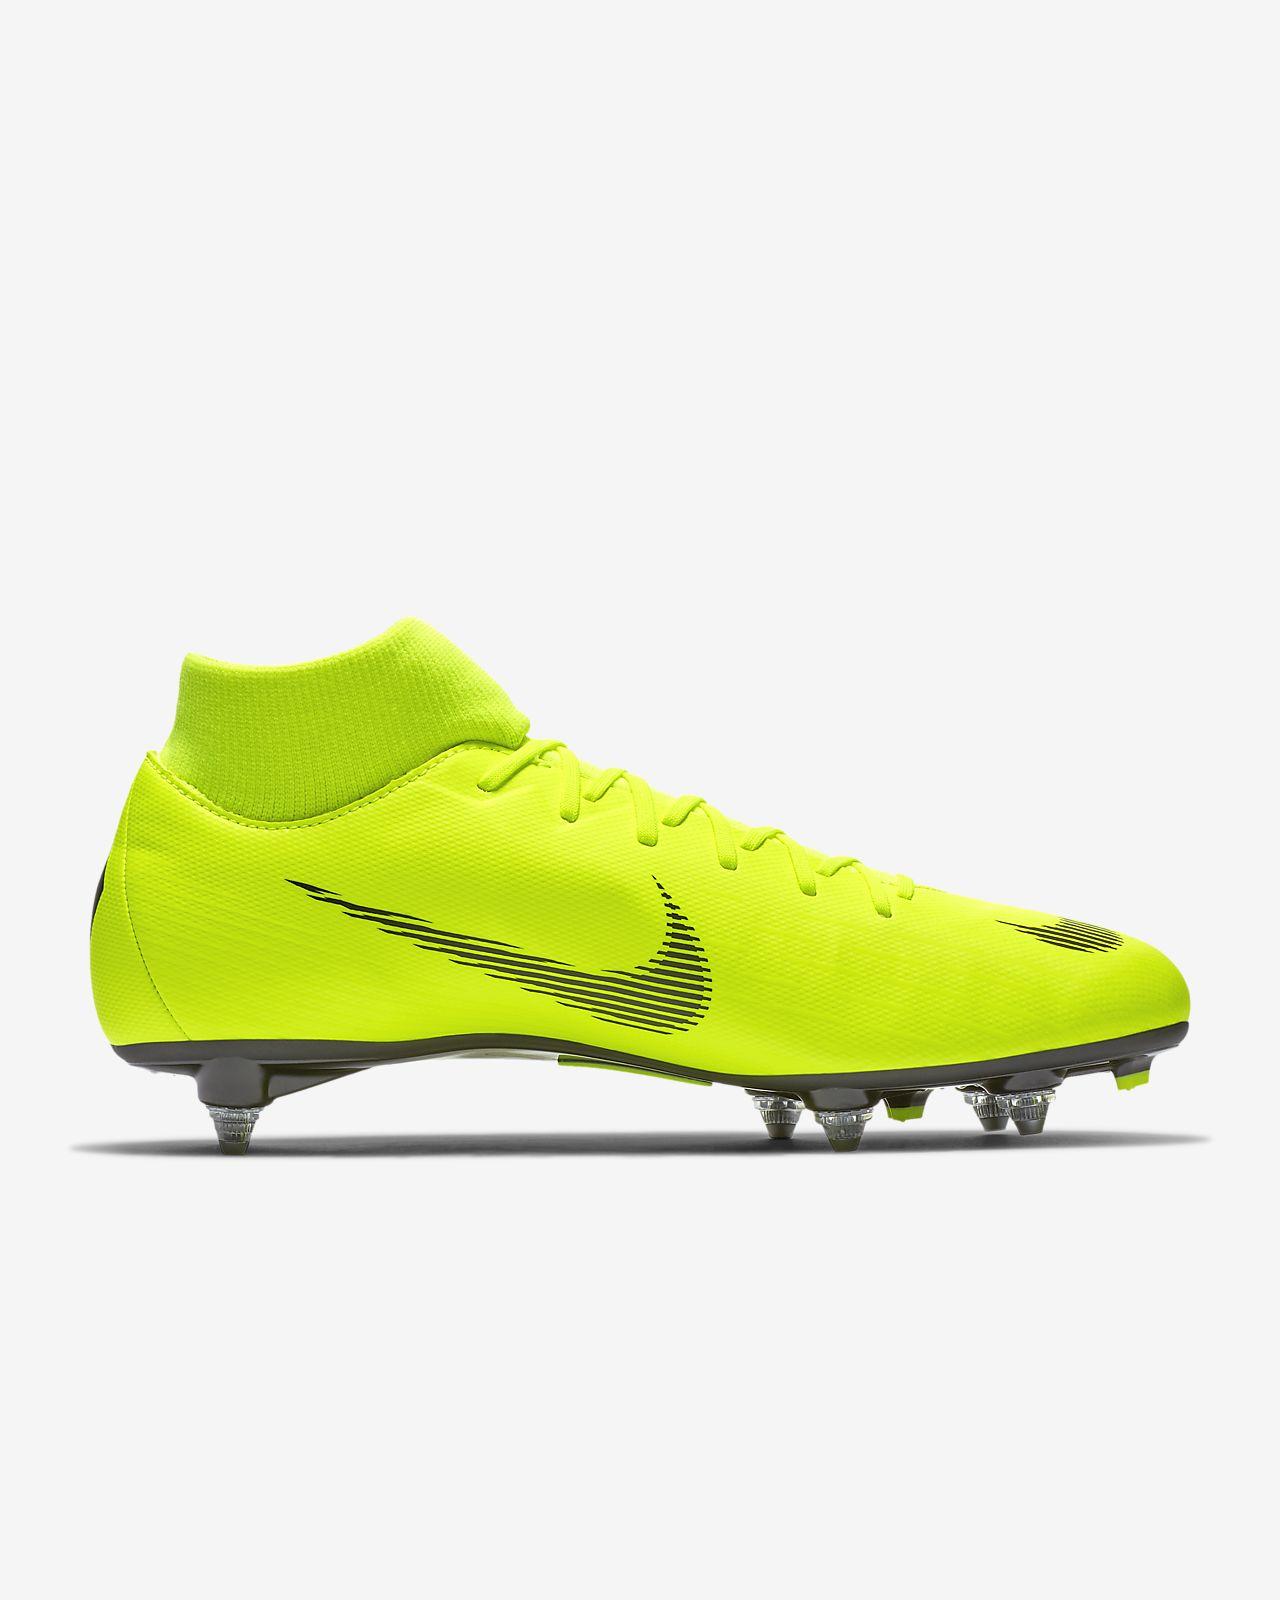 brand new 79ffc fed9b ... Chaussure de football à crampons pour terrain gras Nike Mercurial  Superfly VI Academy SG-PRO